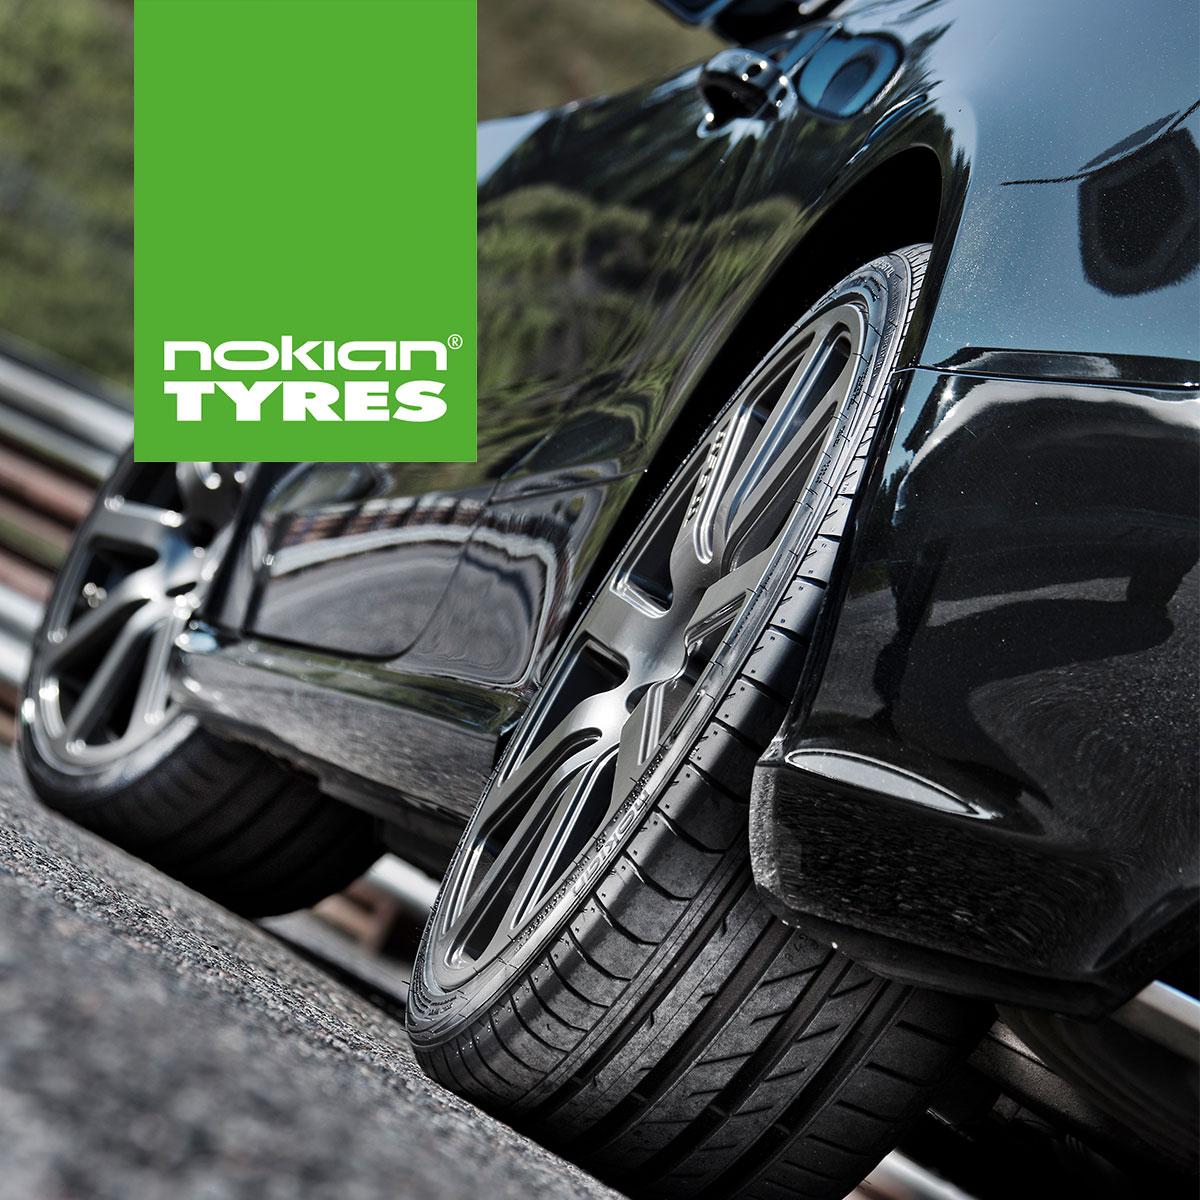 Nokian Tyres Plc.